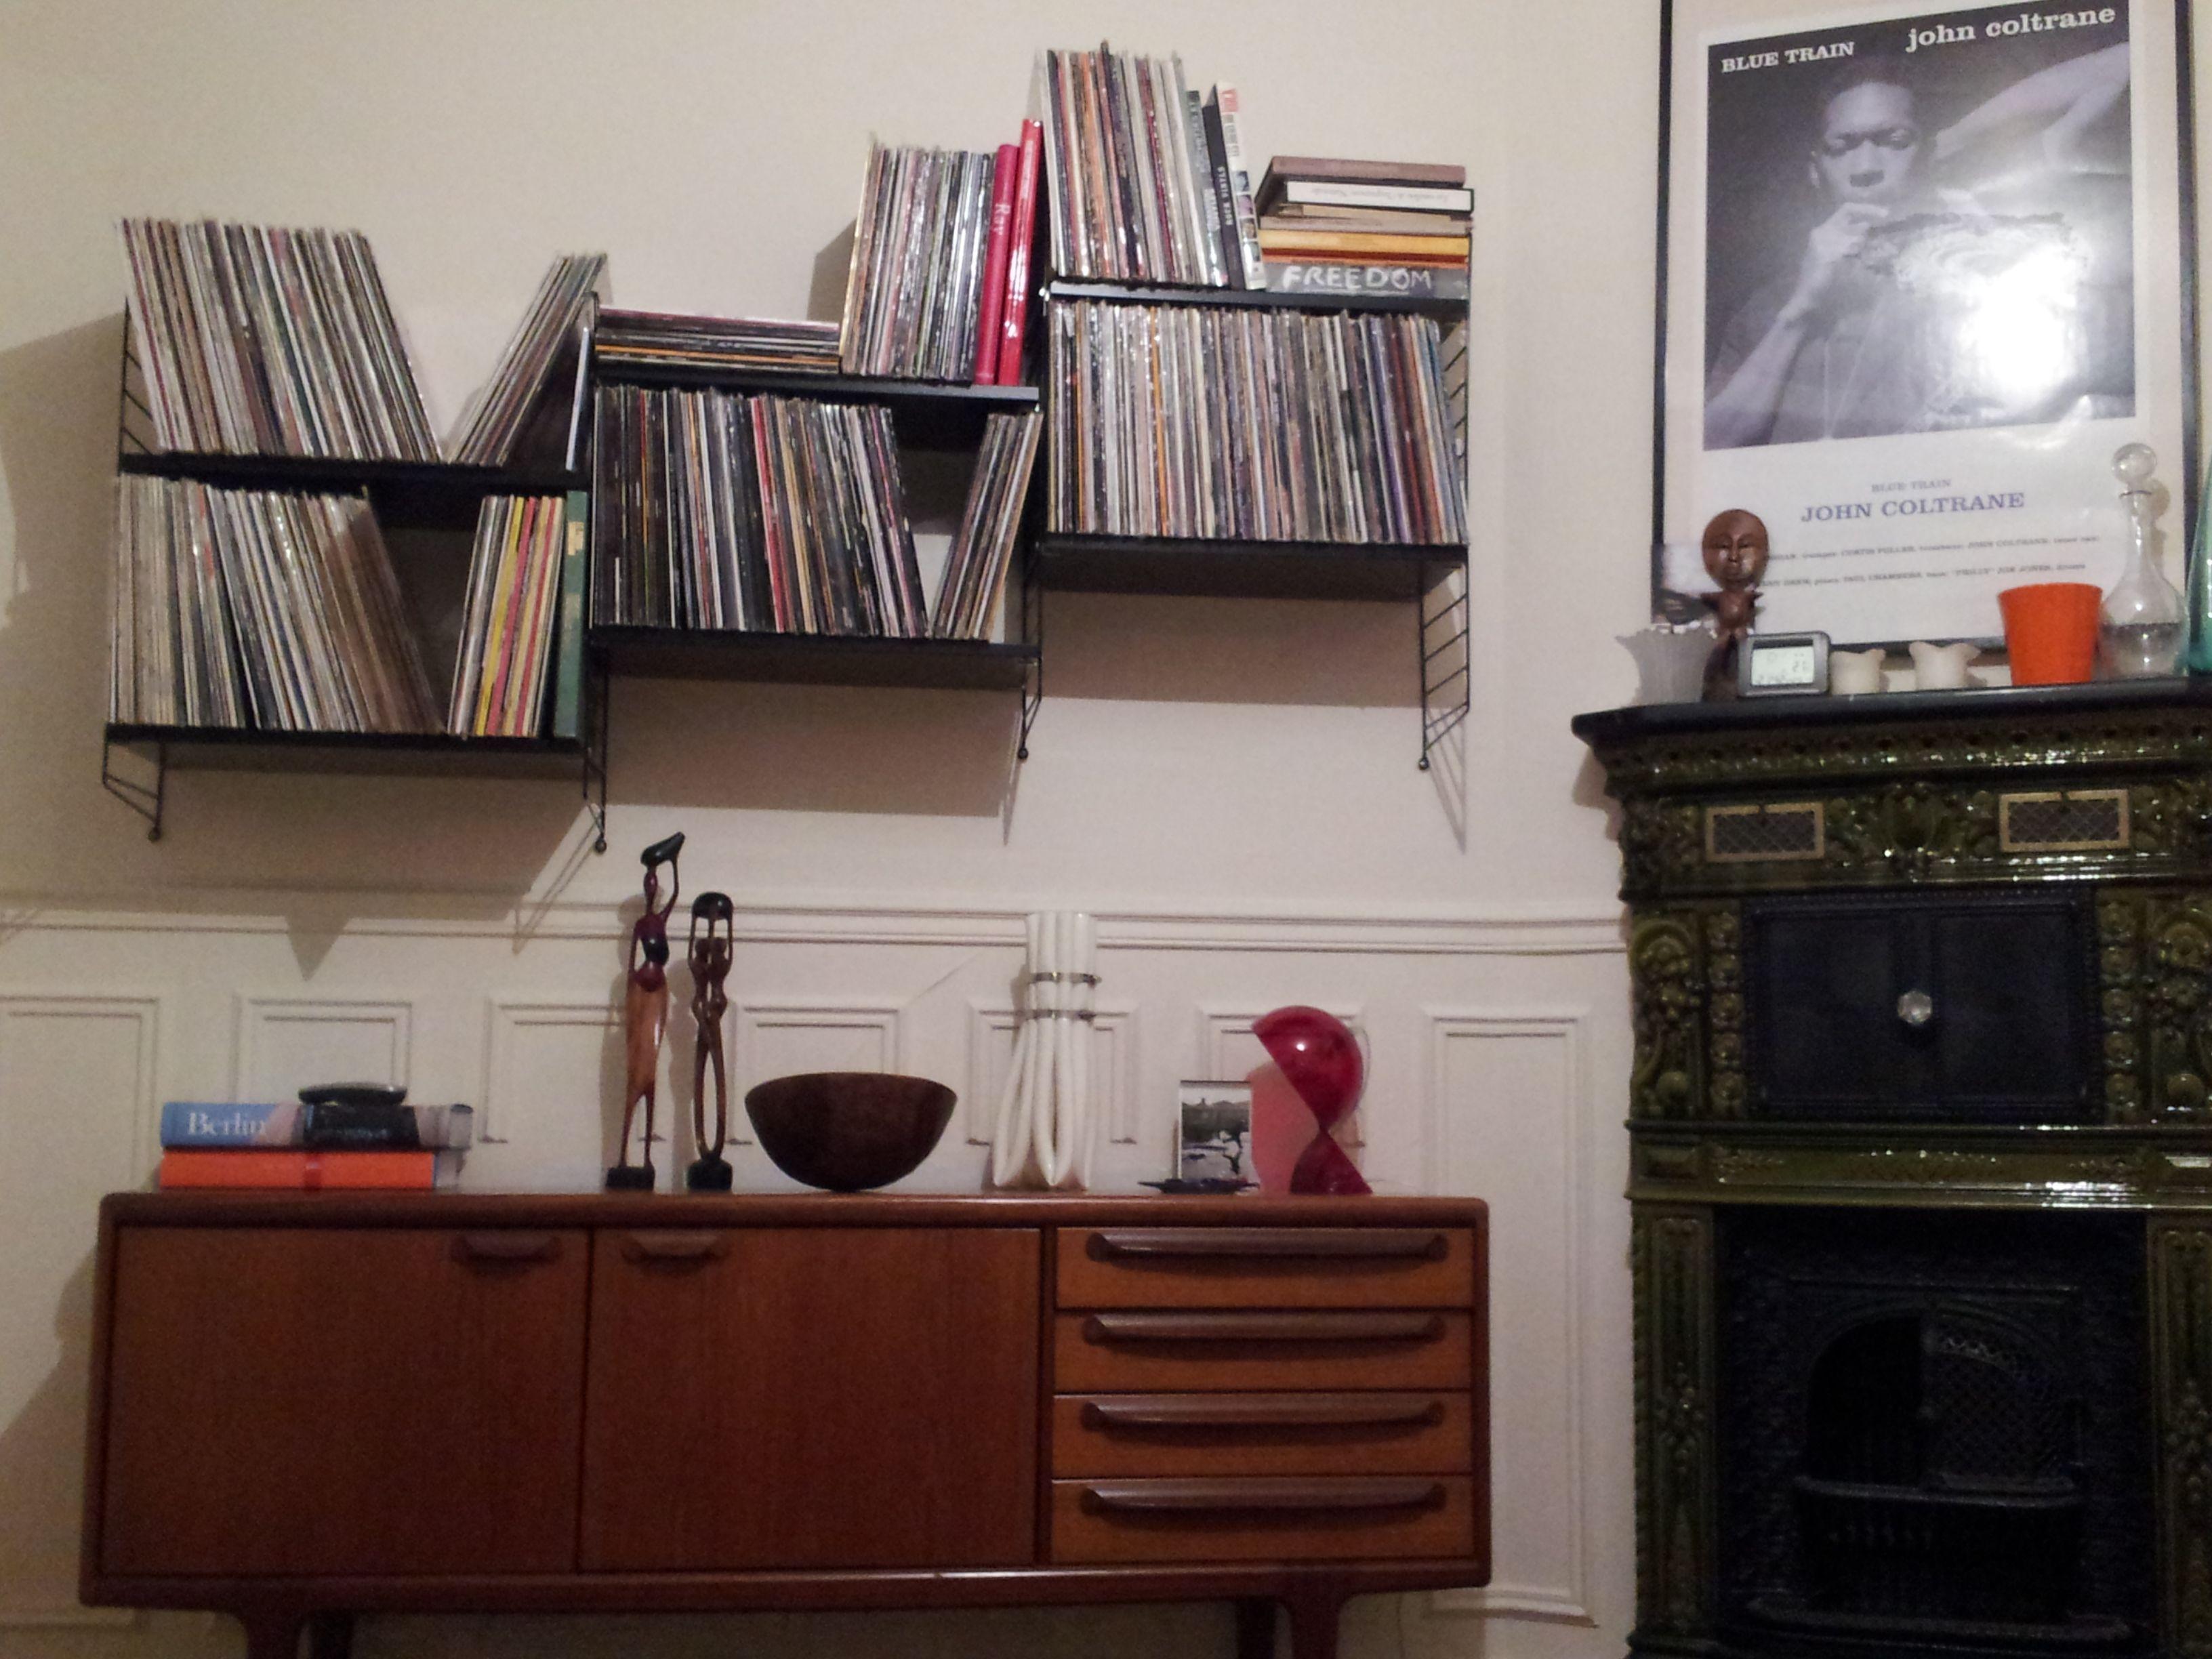 Design String Kasten : String shelves under vinyl load media storage string shelf